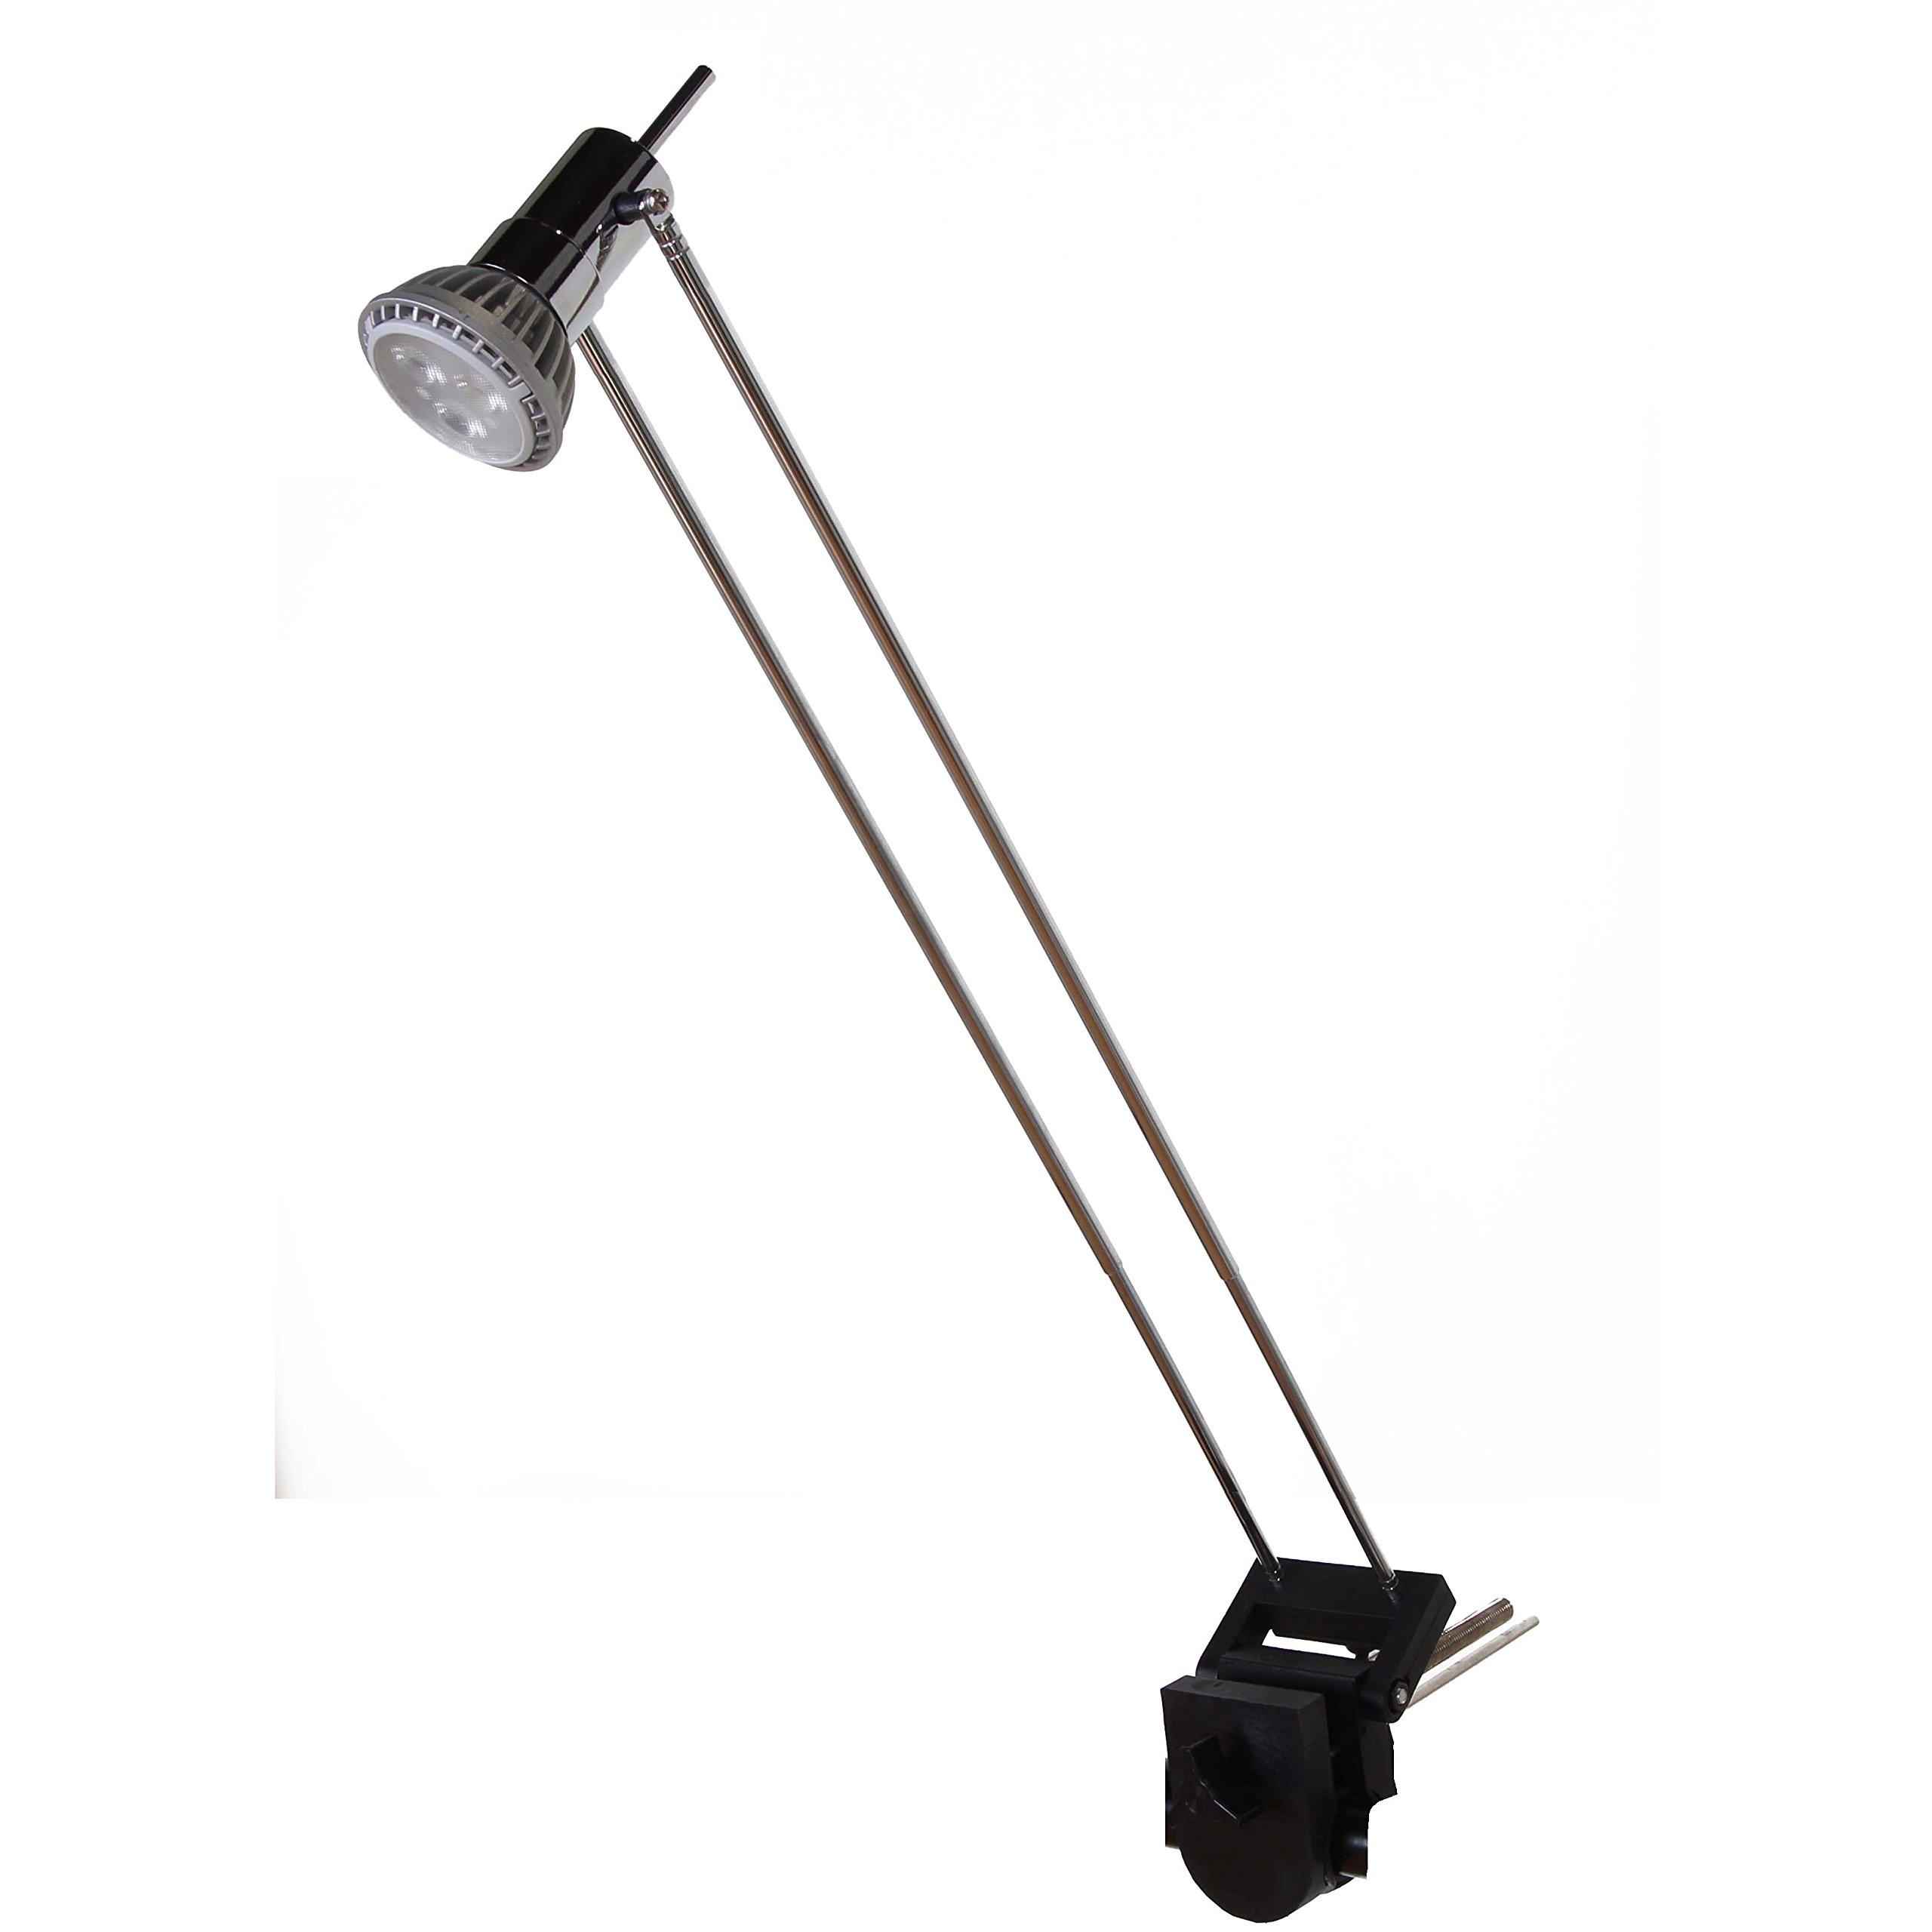 Direct-Lighting LED Antenna arm Display Light DL-59843